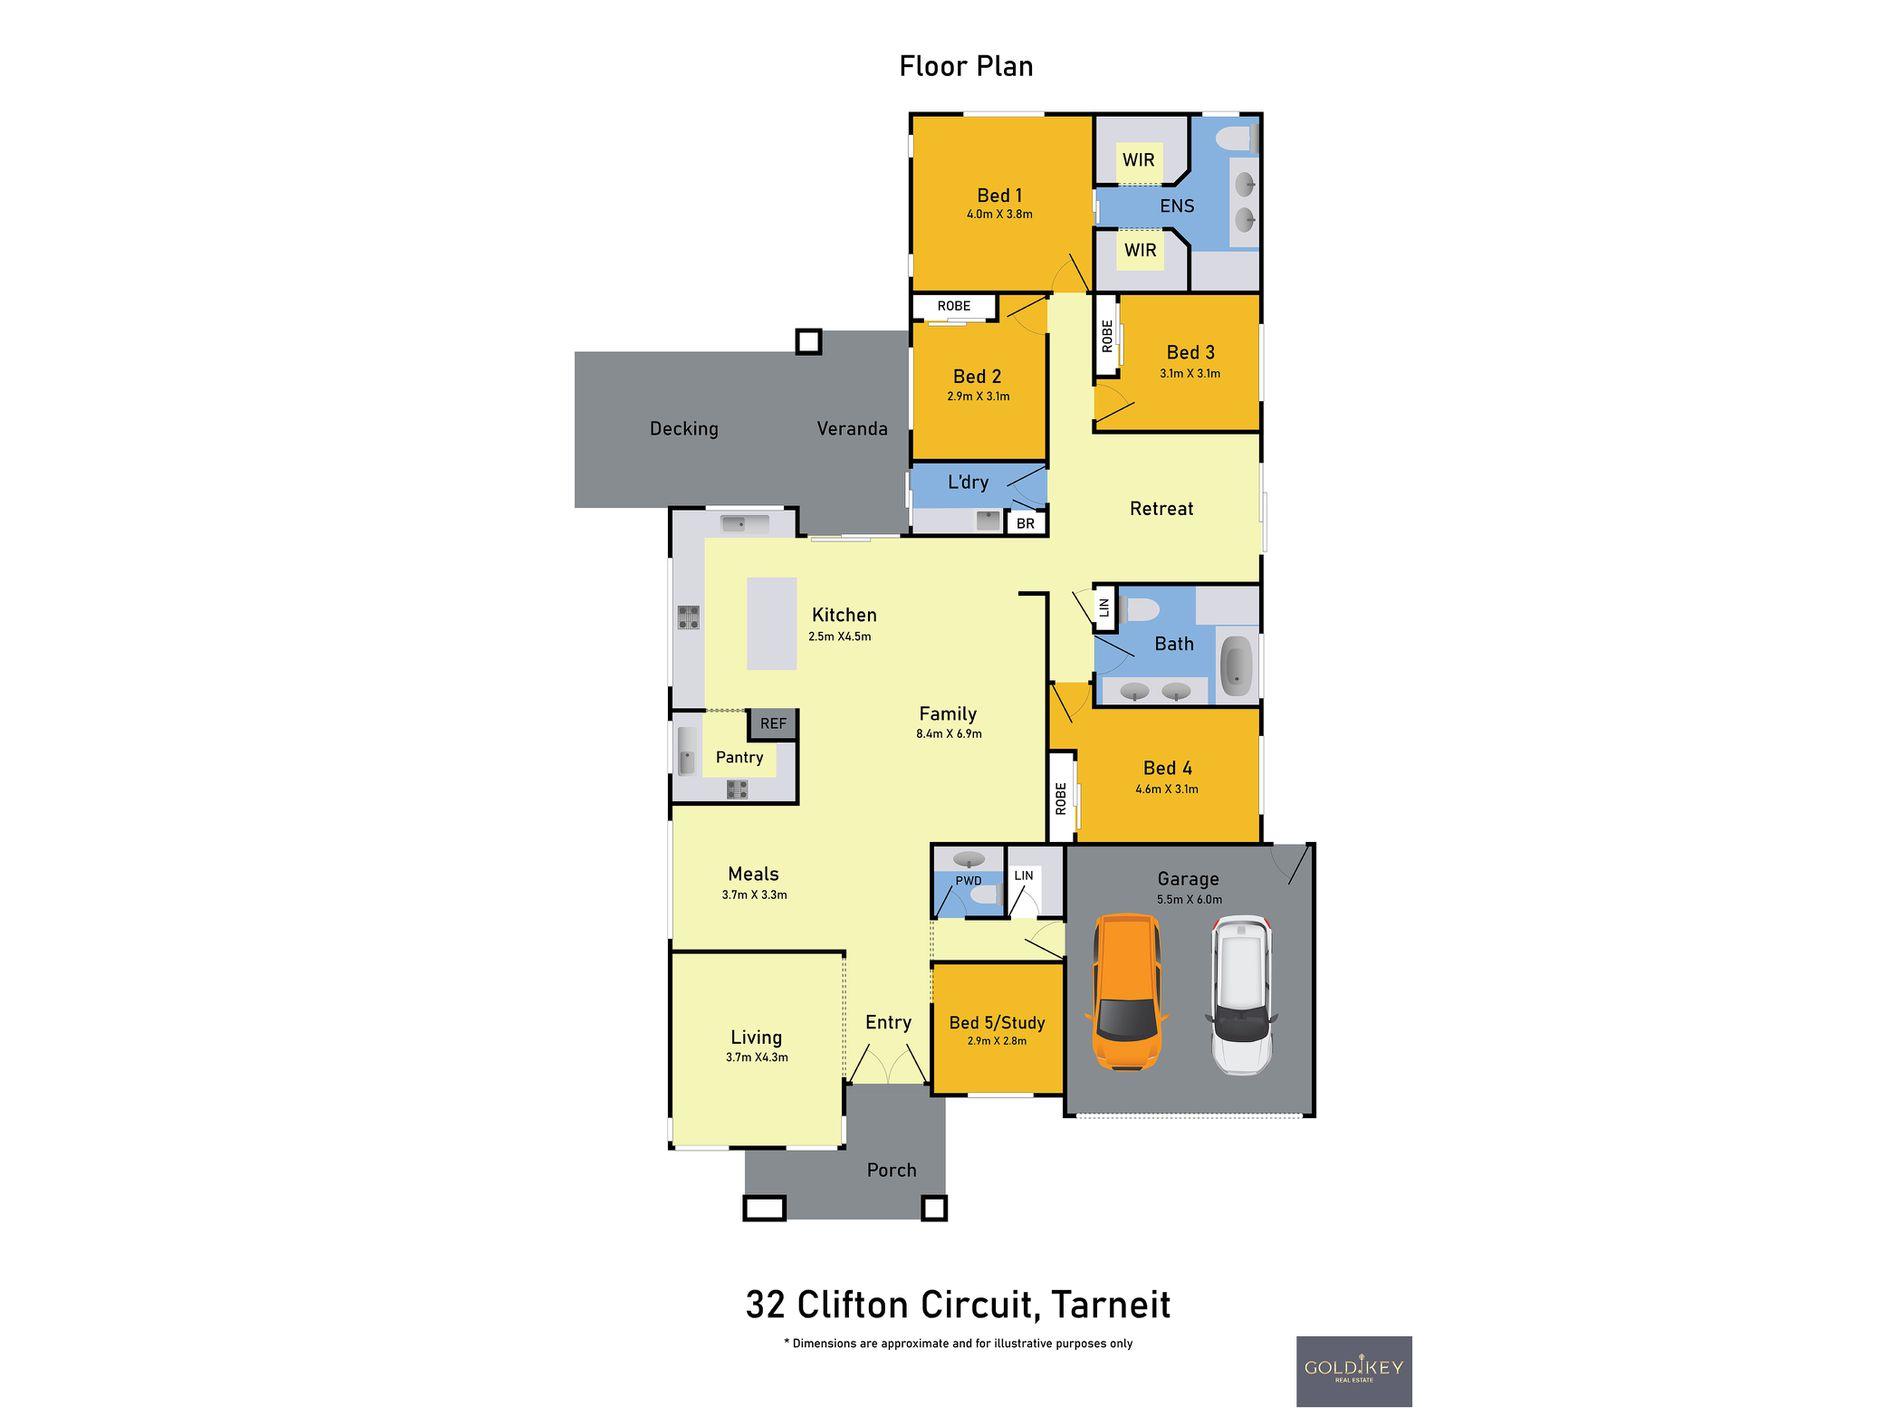 32 Clifton Circuit, Tarneit